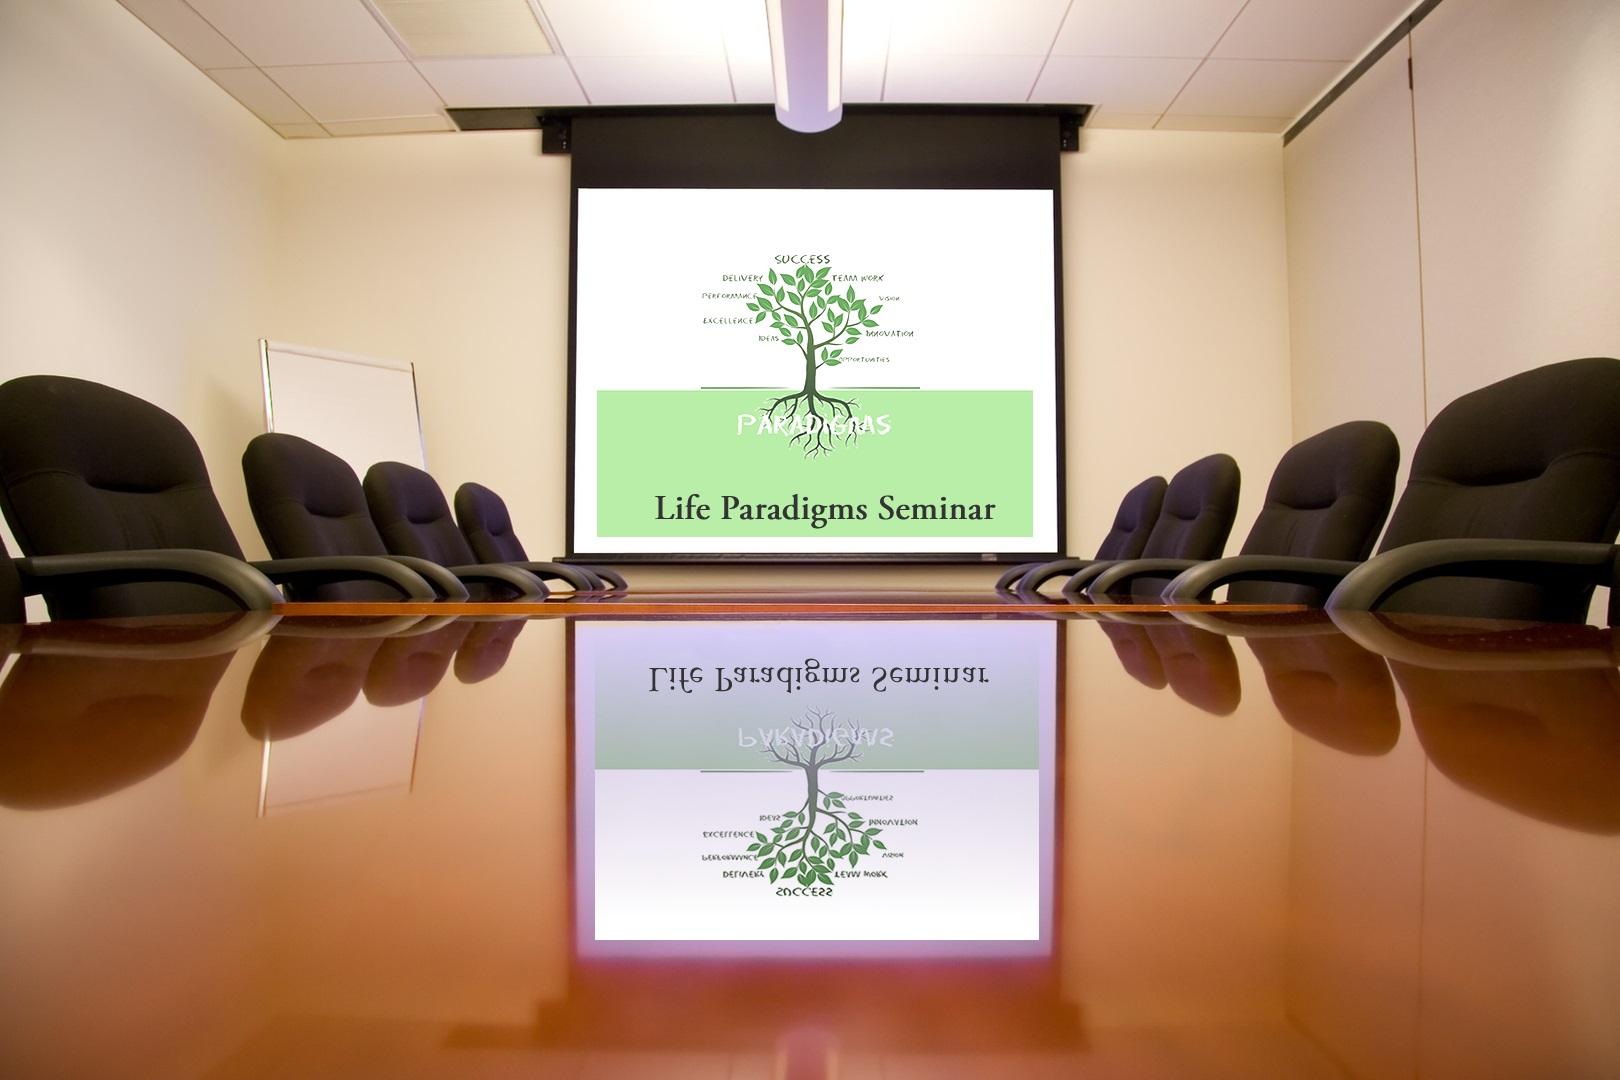 Life Paradigms Seminar (LPS)